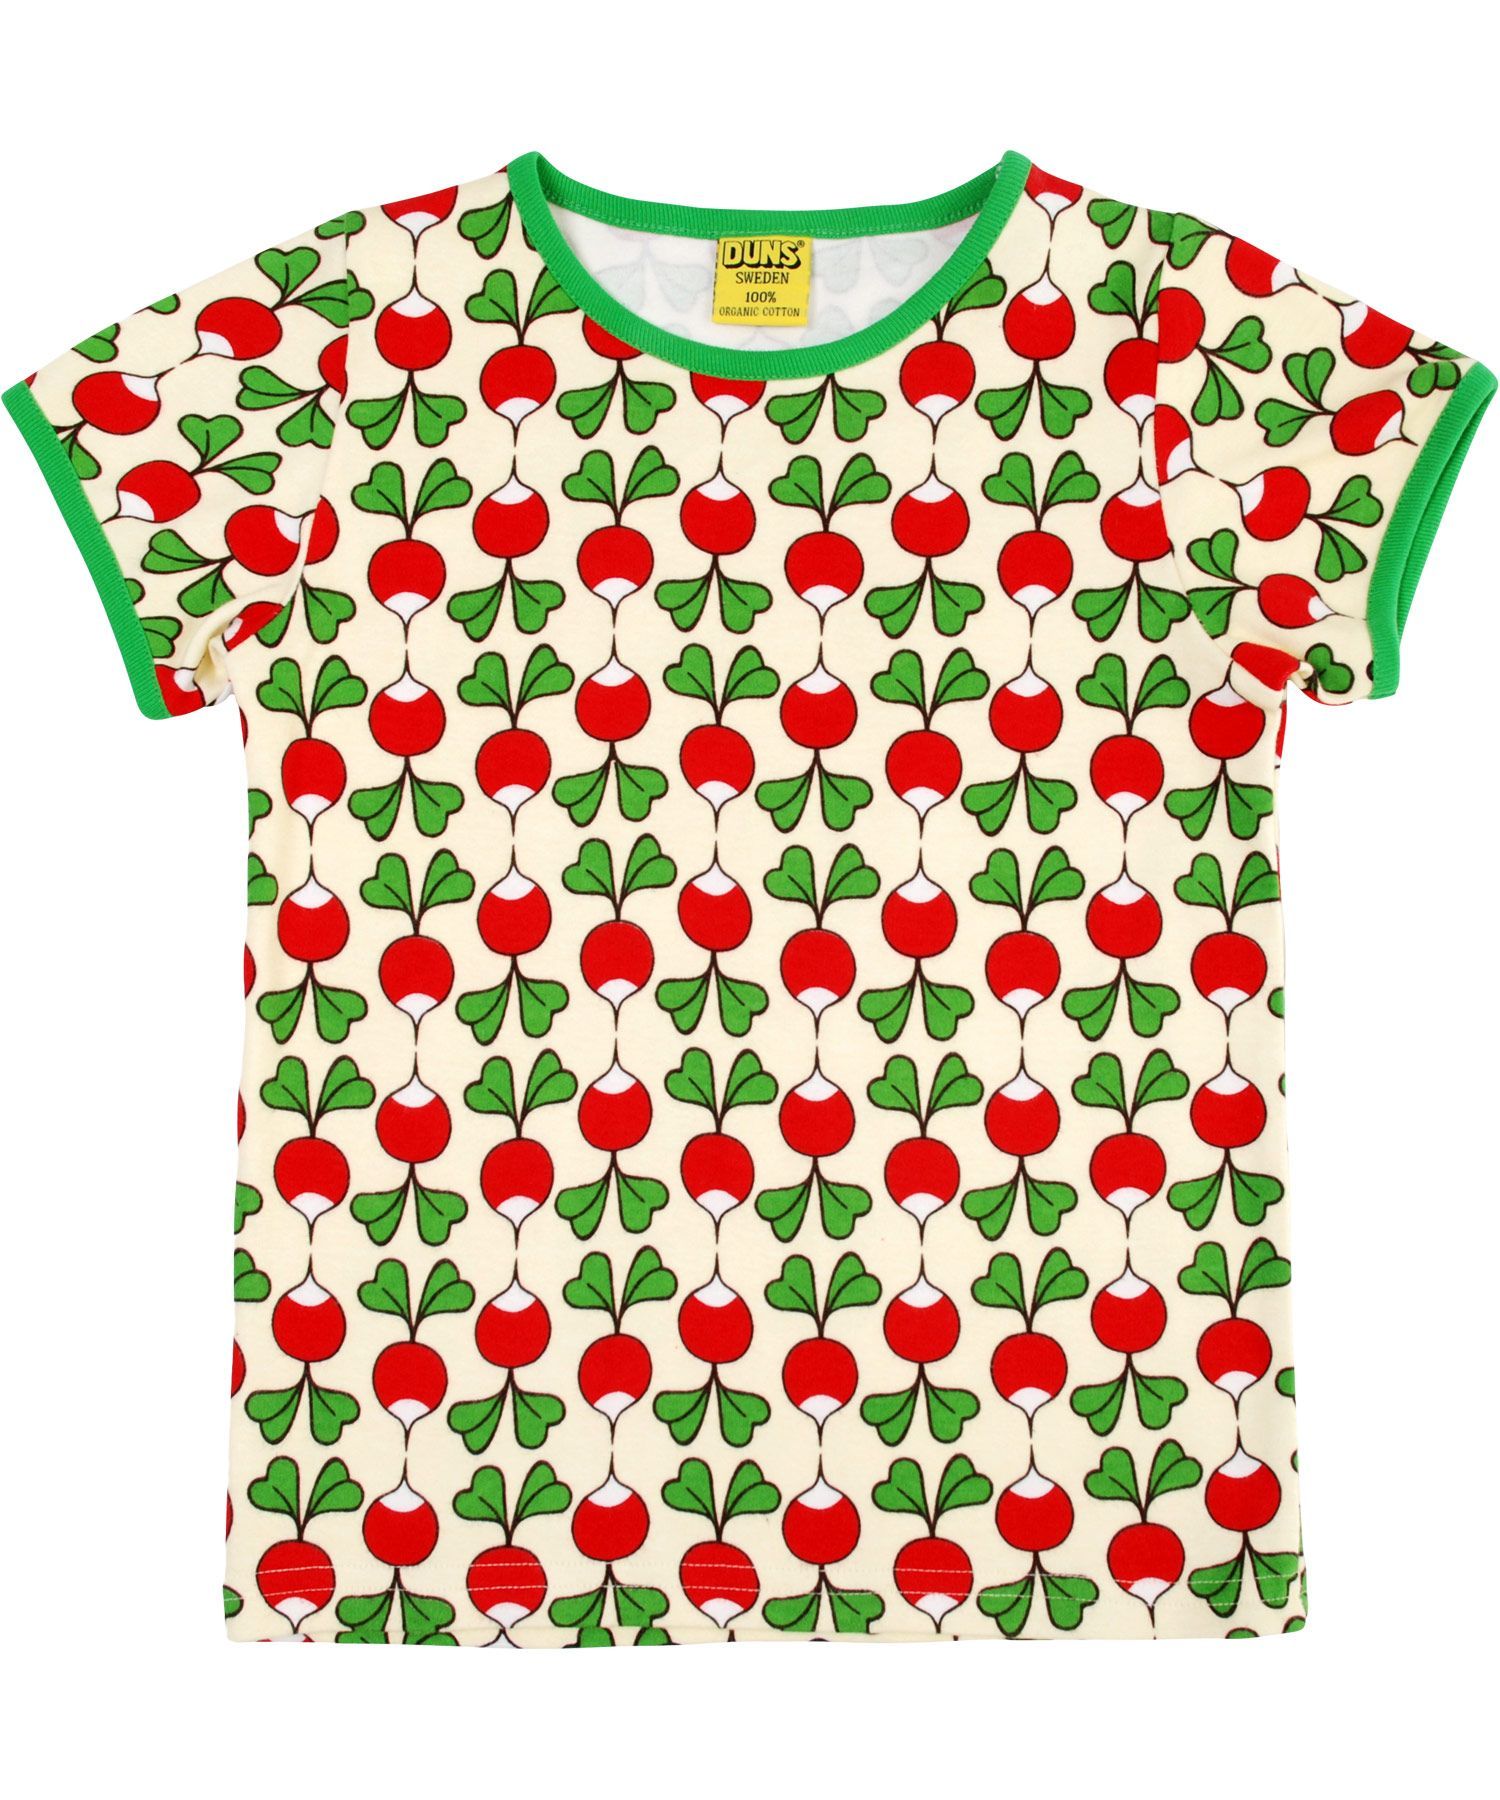 Duns of Sweden adorable raddish printed TshirtShort sleeve basic